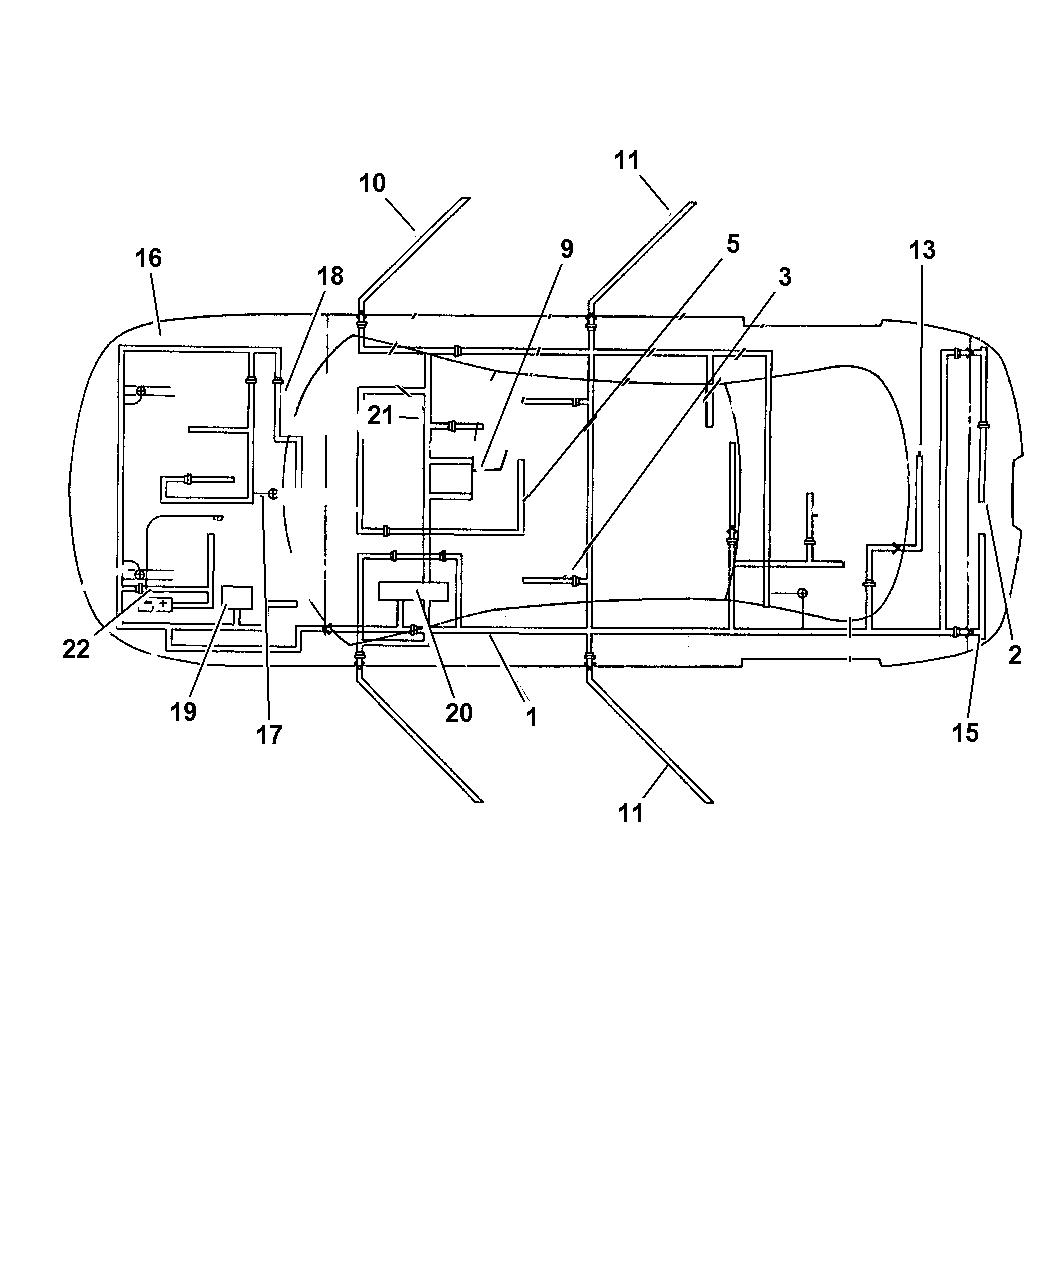 1999 chrysler concorde wiring body & accessories 2001 chrysler concorde engine diagram 1999 chrysler concorde wiring diagram #3